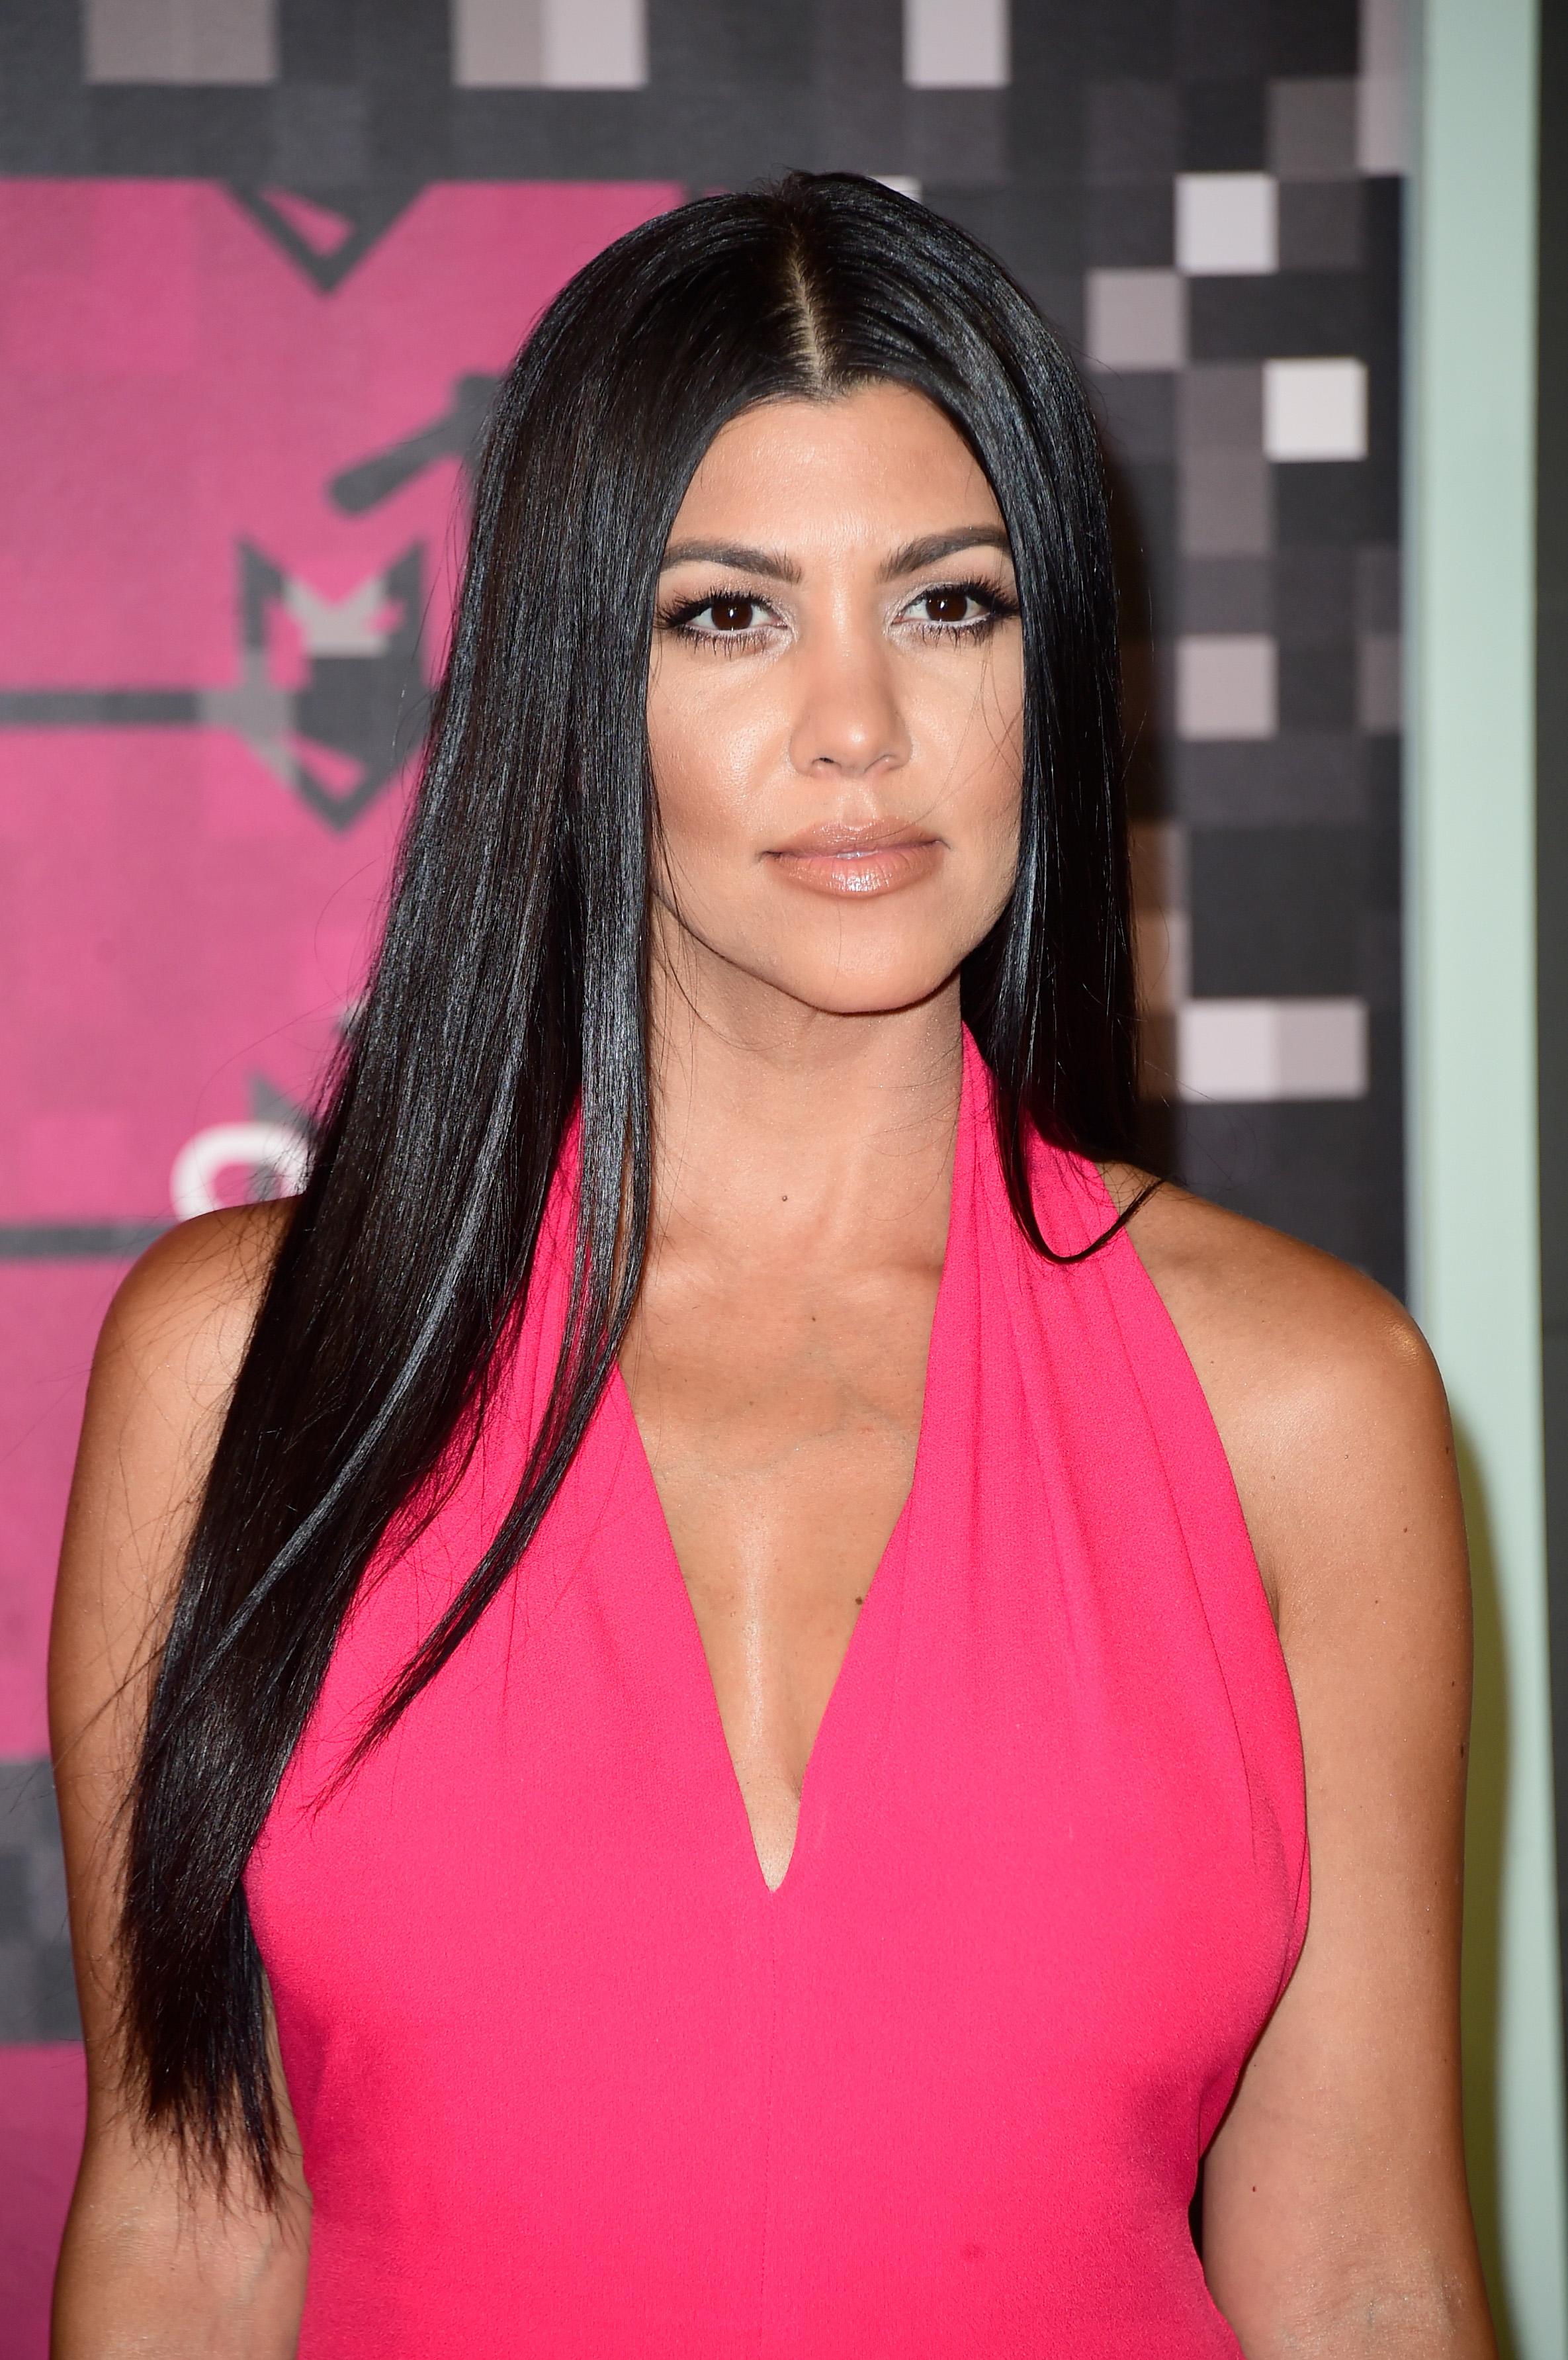 Kourtney Kardashian Poses Nude For Vanity Fairs -6222